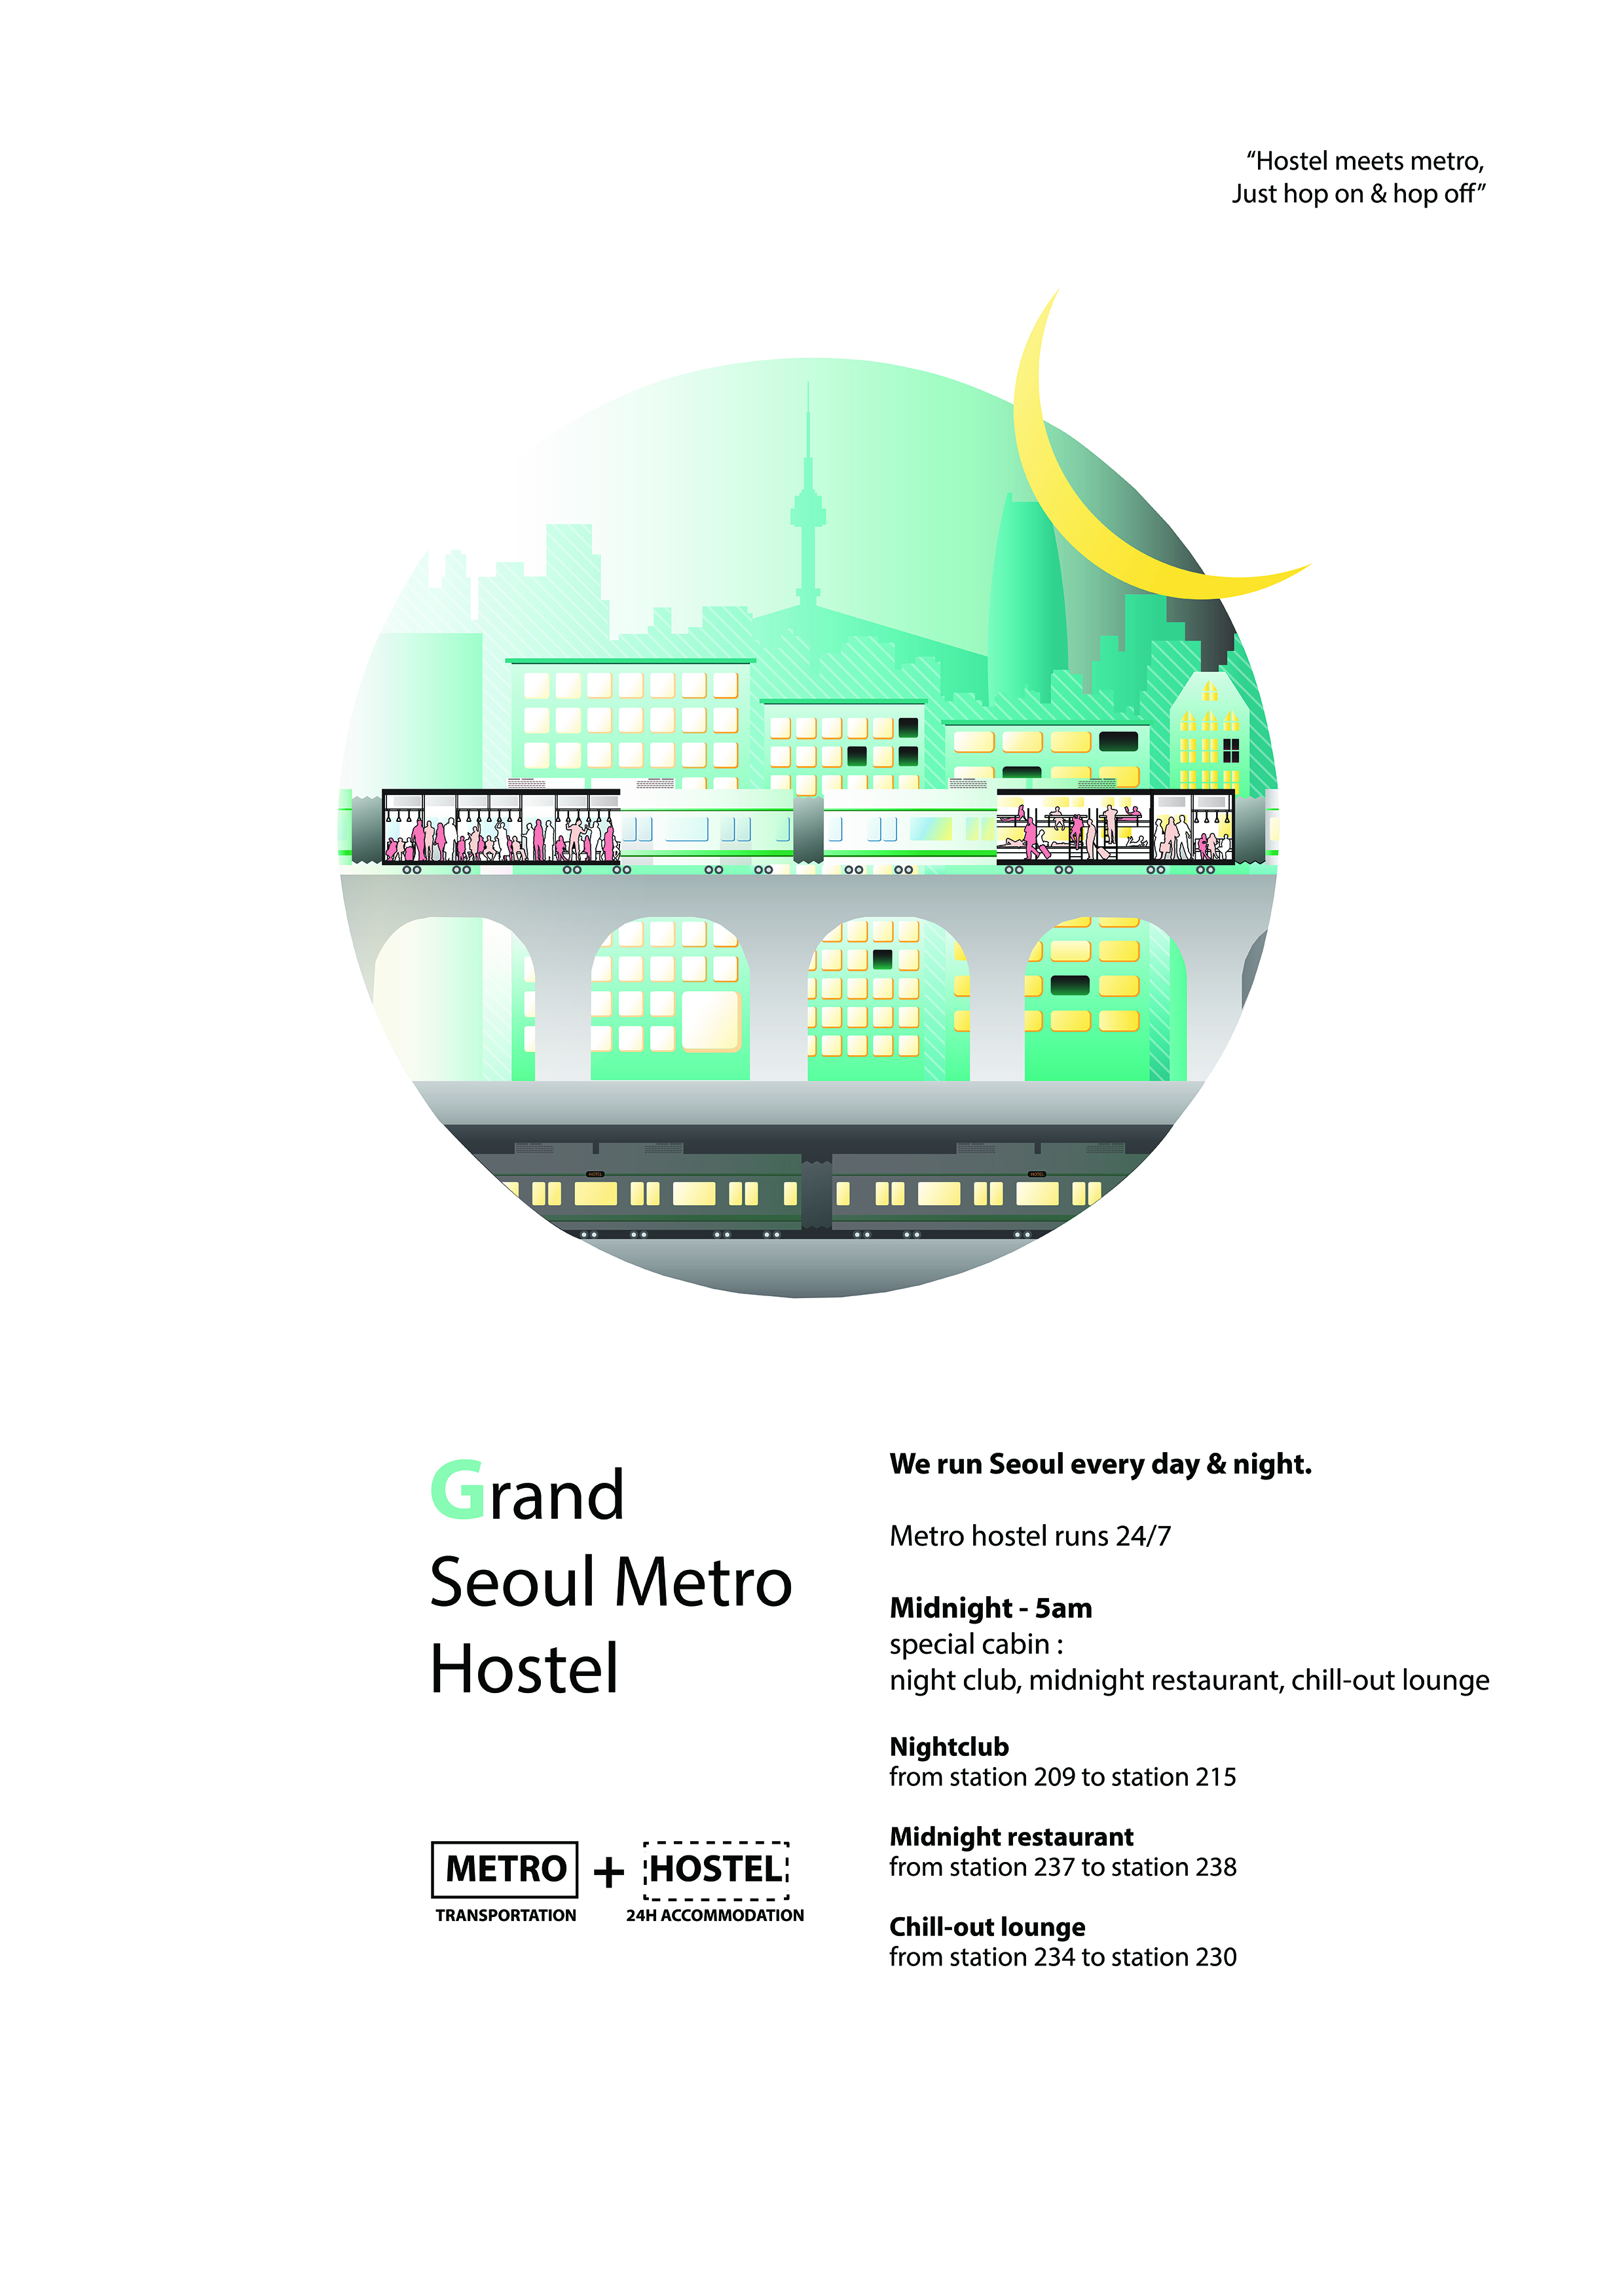 Grand Seoul Metro